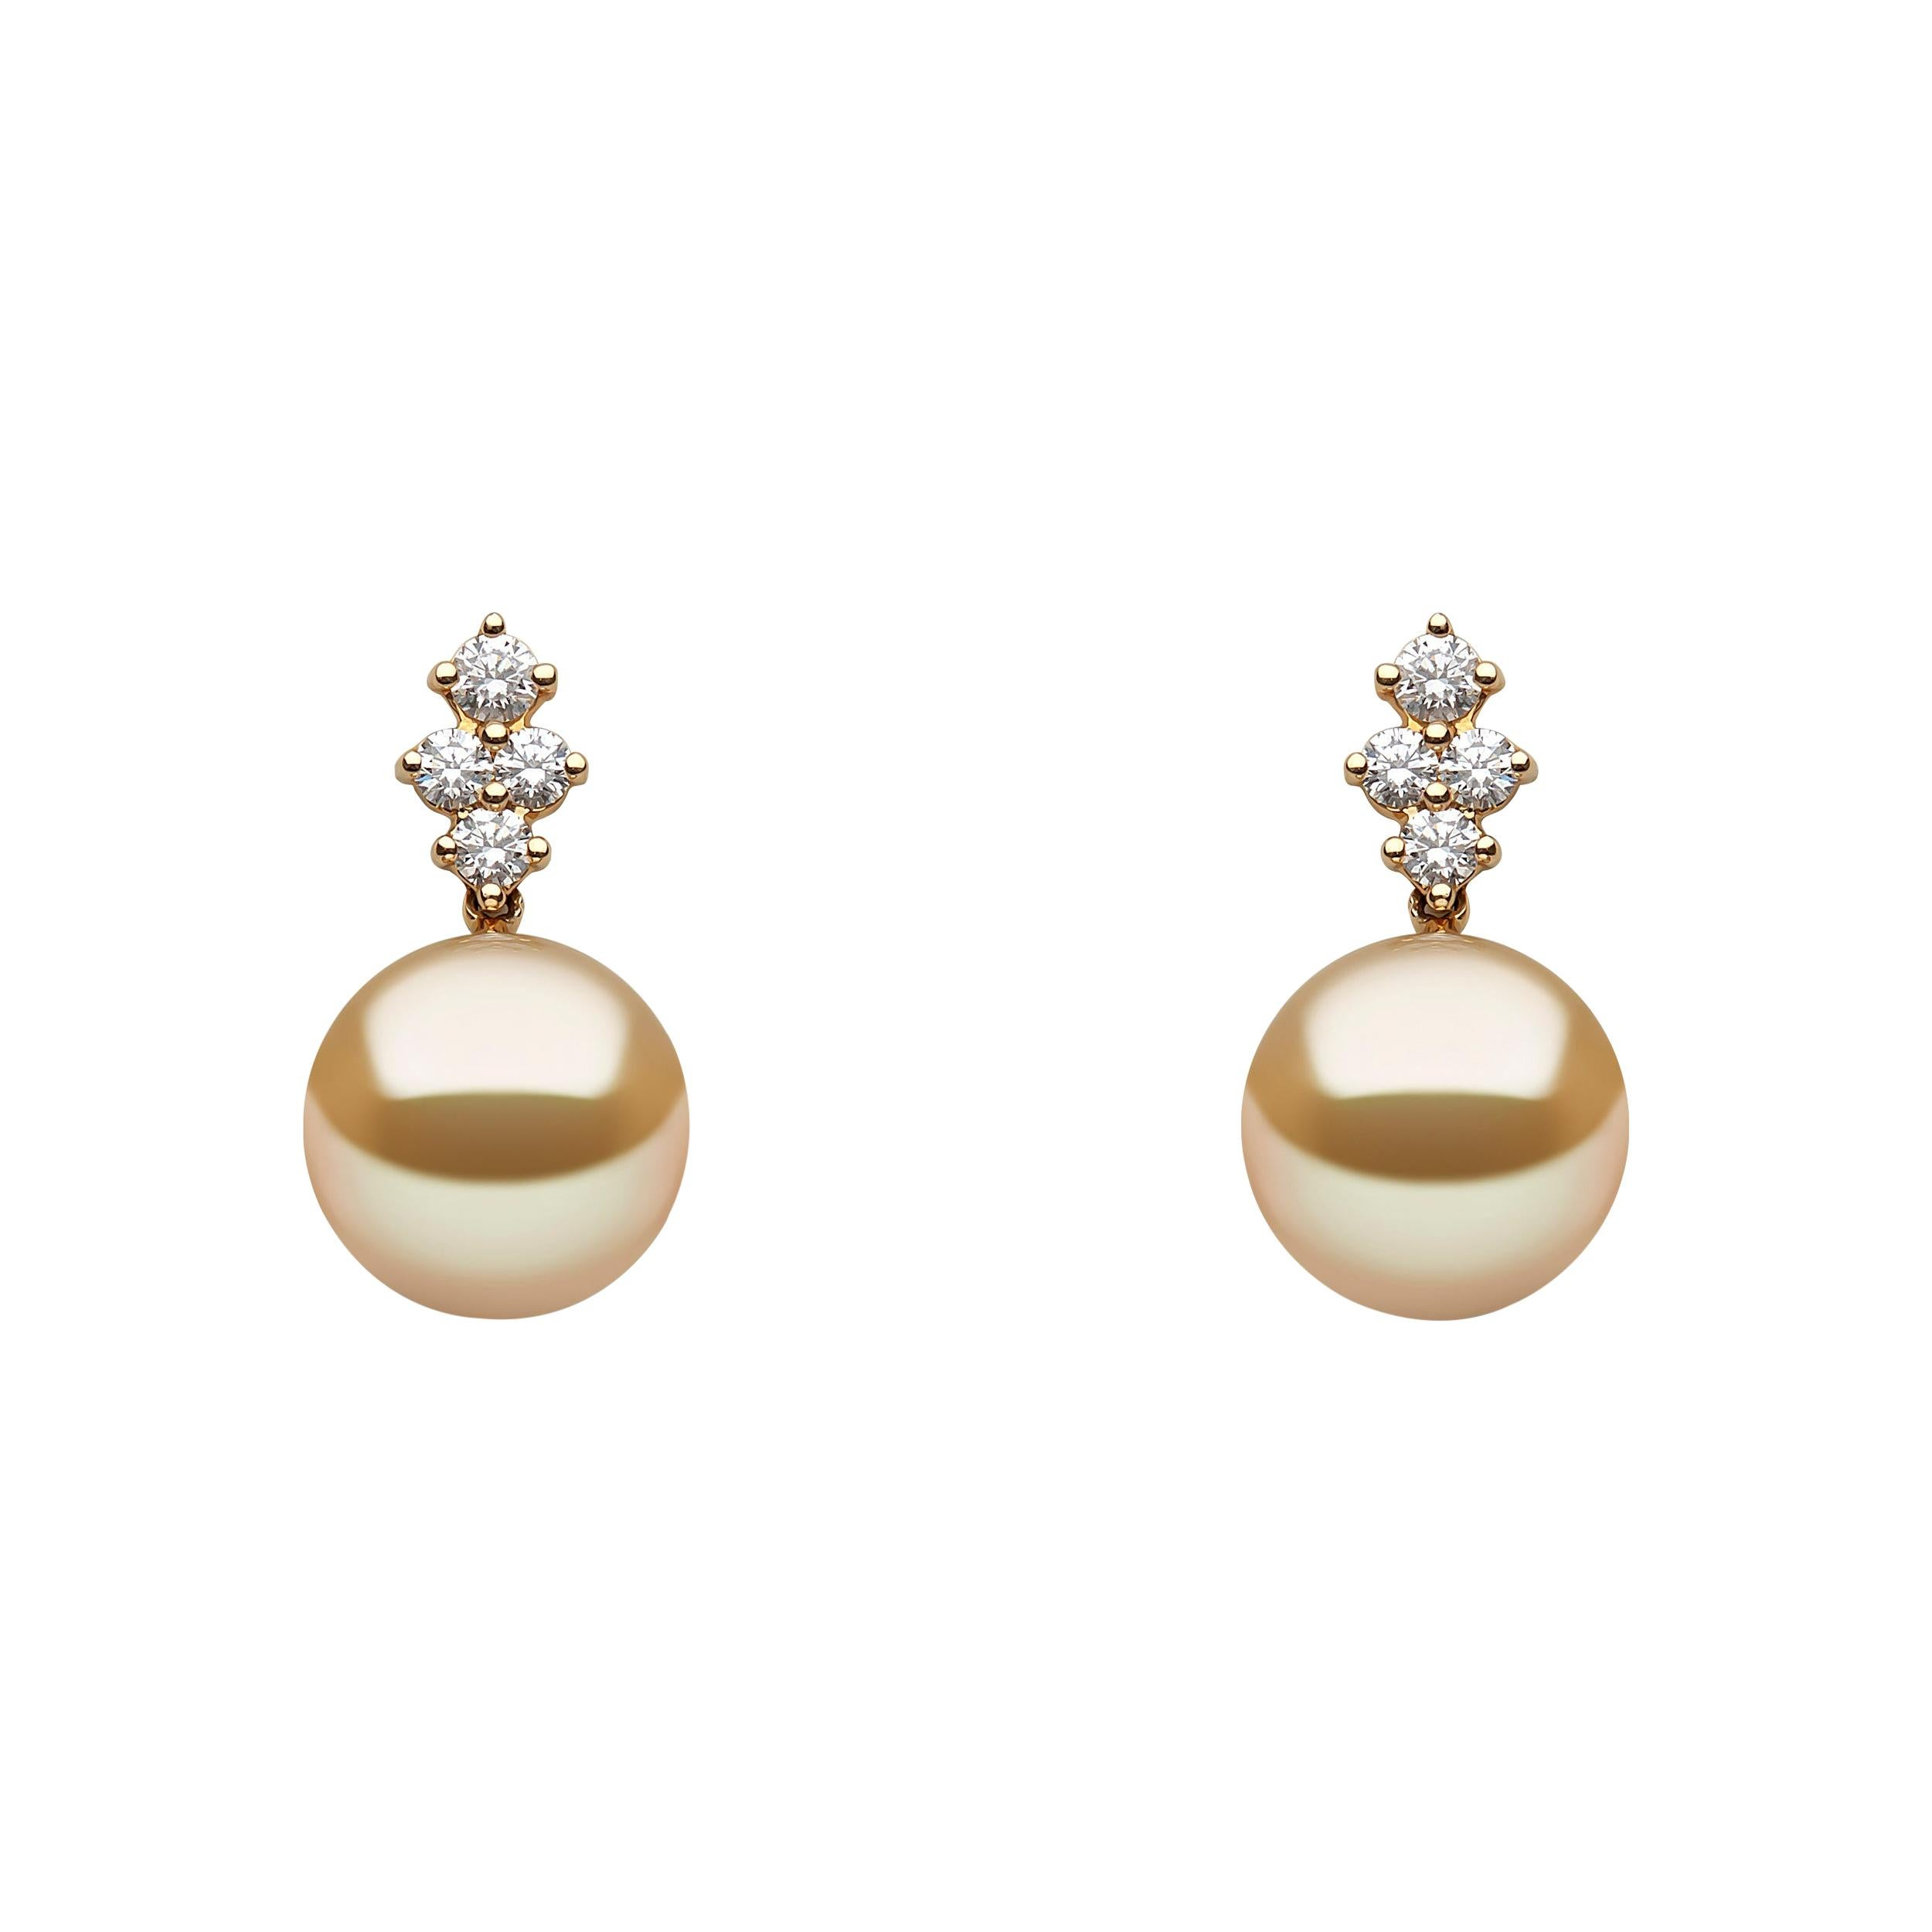 Yoko London Golden South Sea Pearl and Diamond Earrings in 18 Karat Yellow Gold